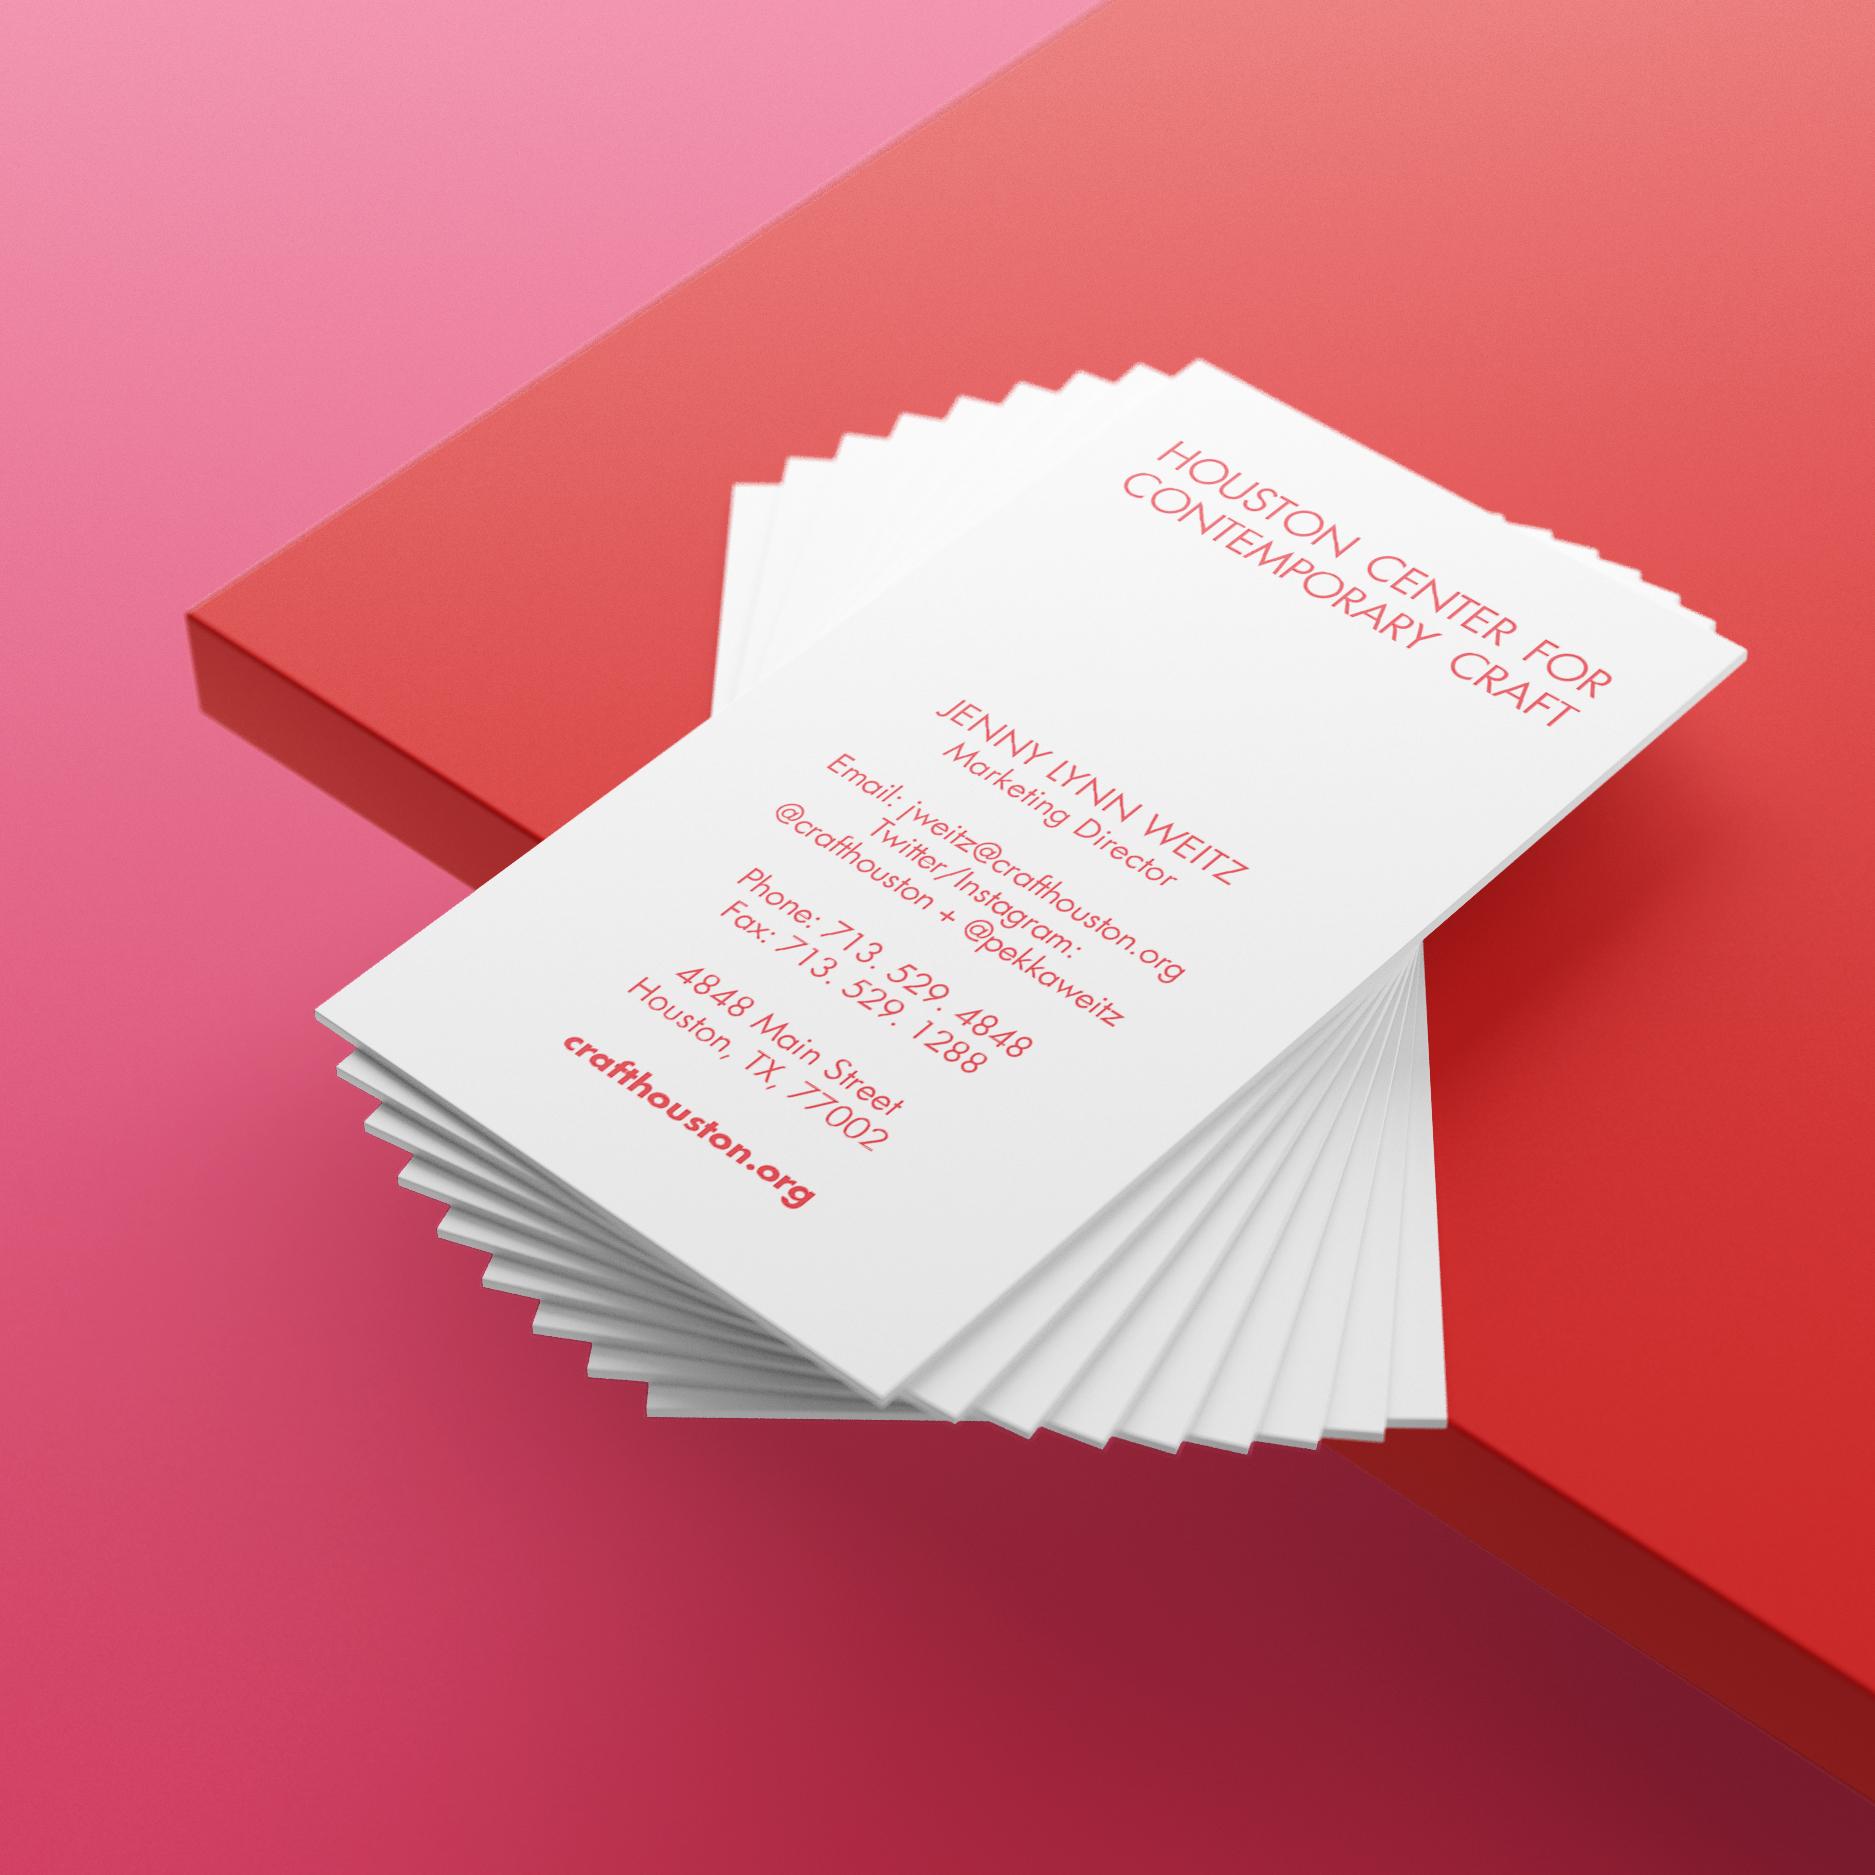 HCCC-Business-Cards-Presentation-1500px.jpg